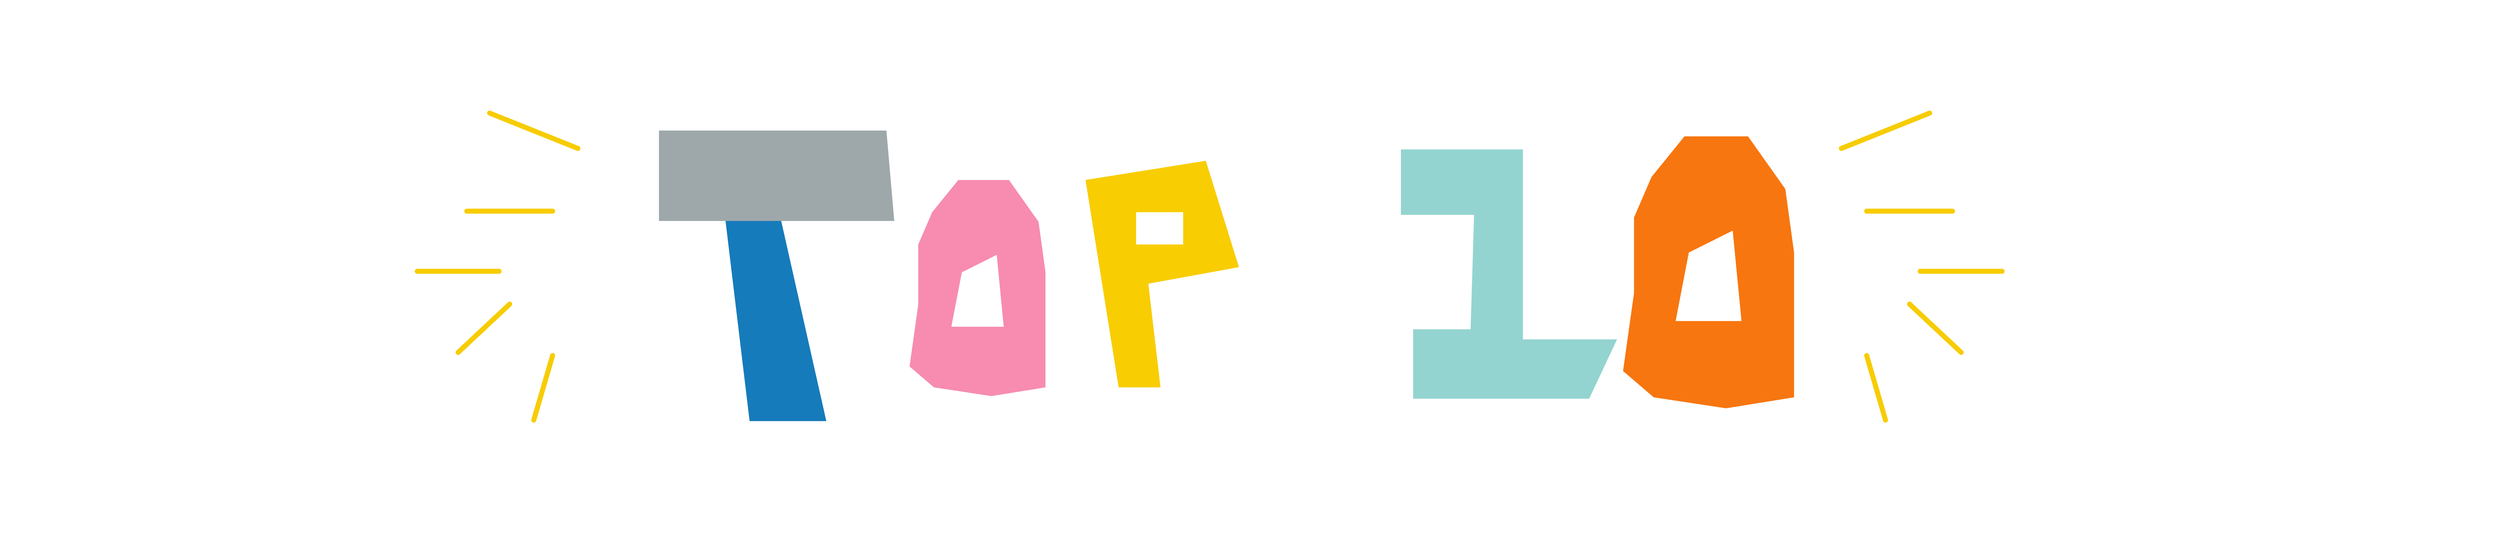 Top10-01-01-01.png